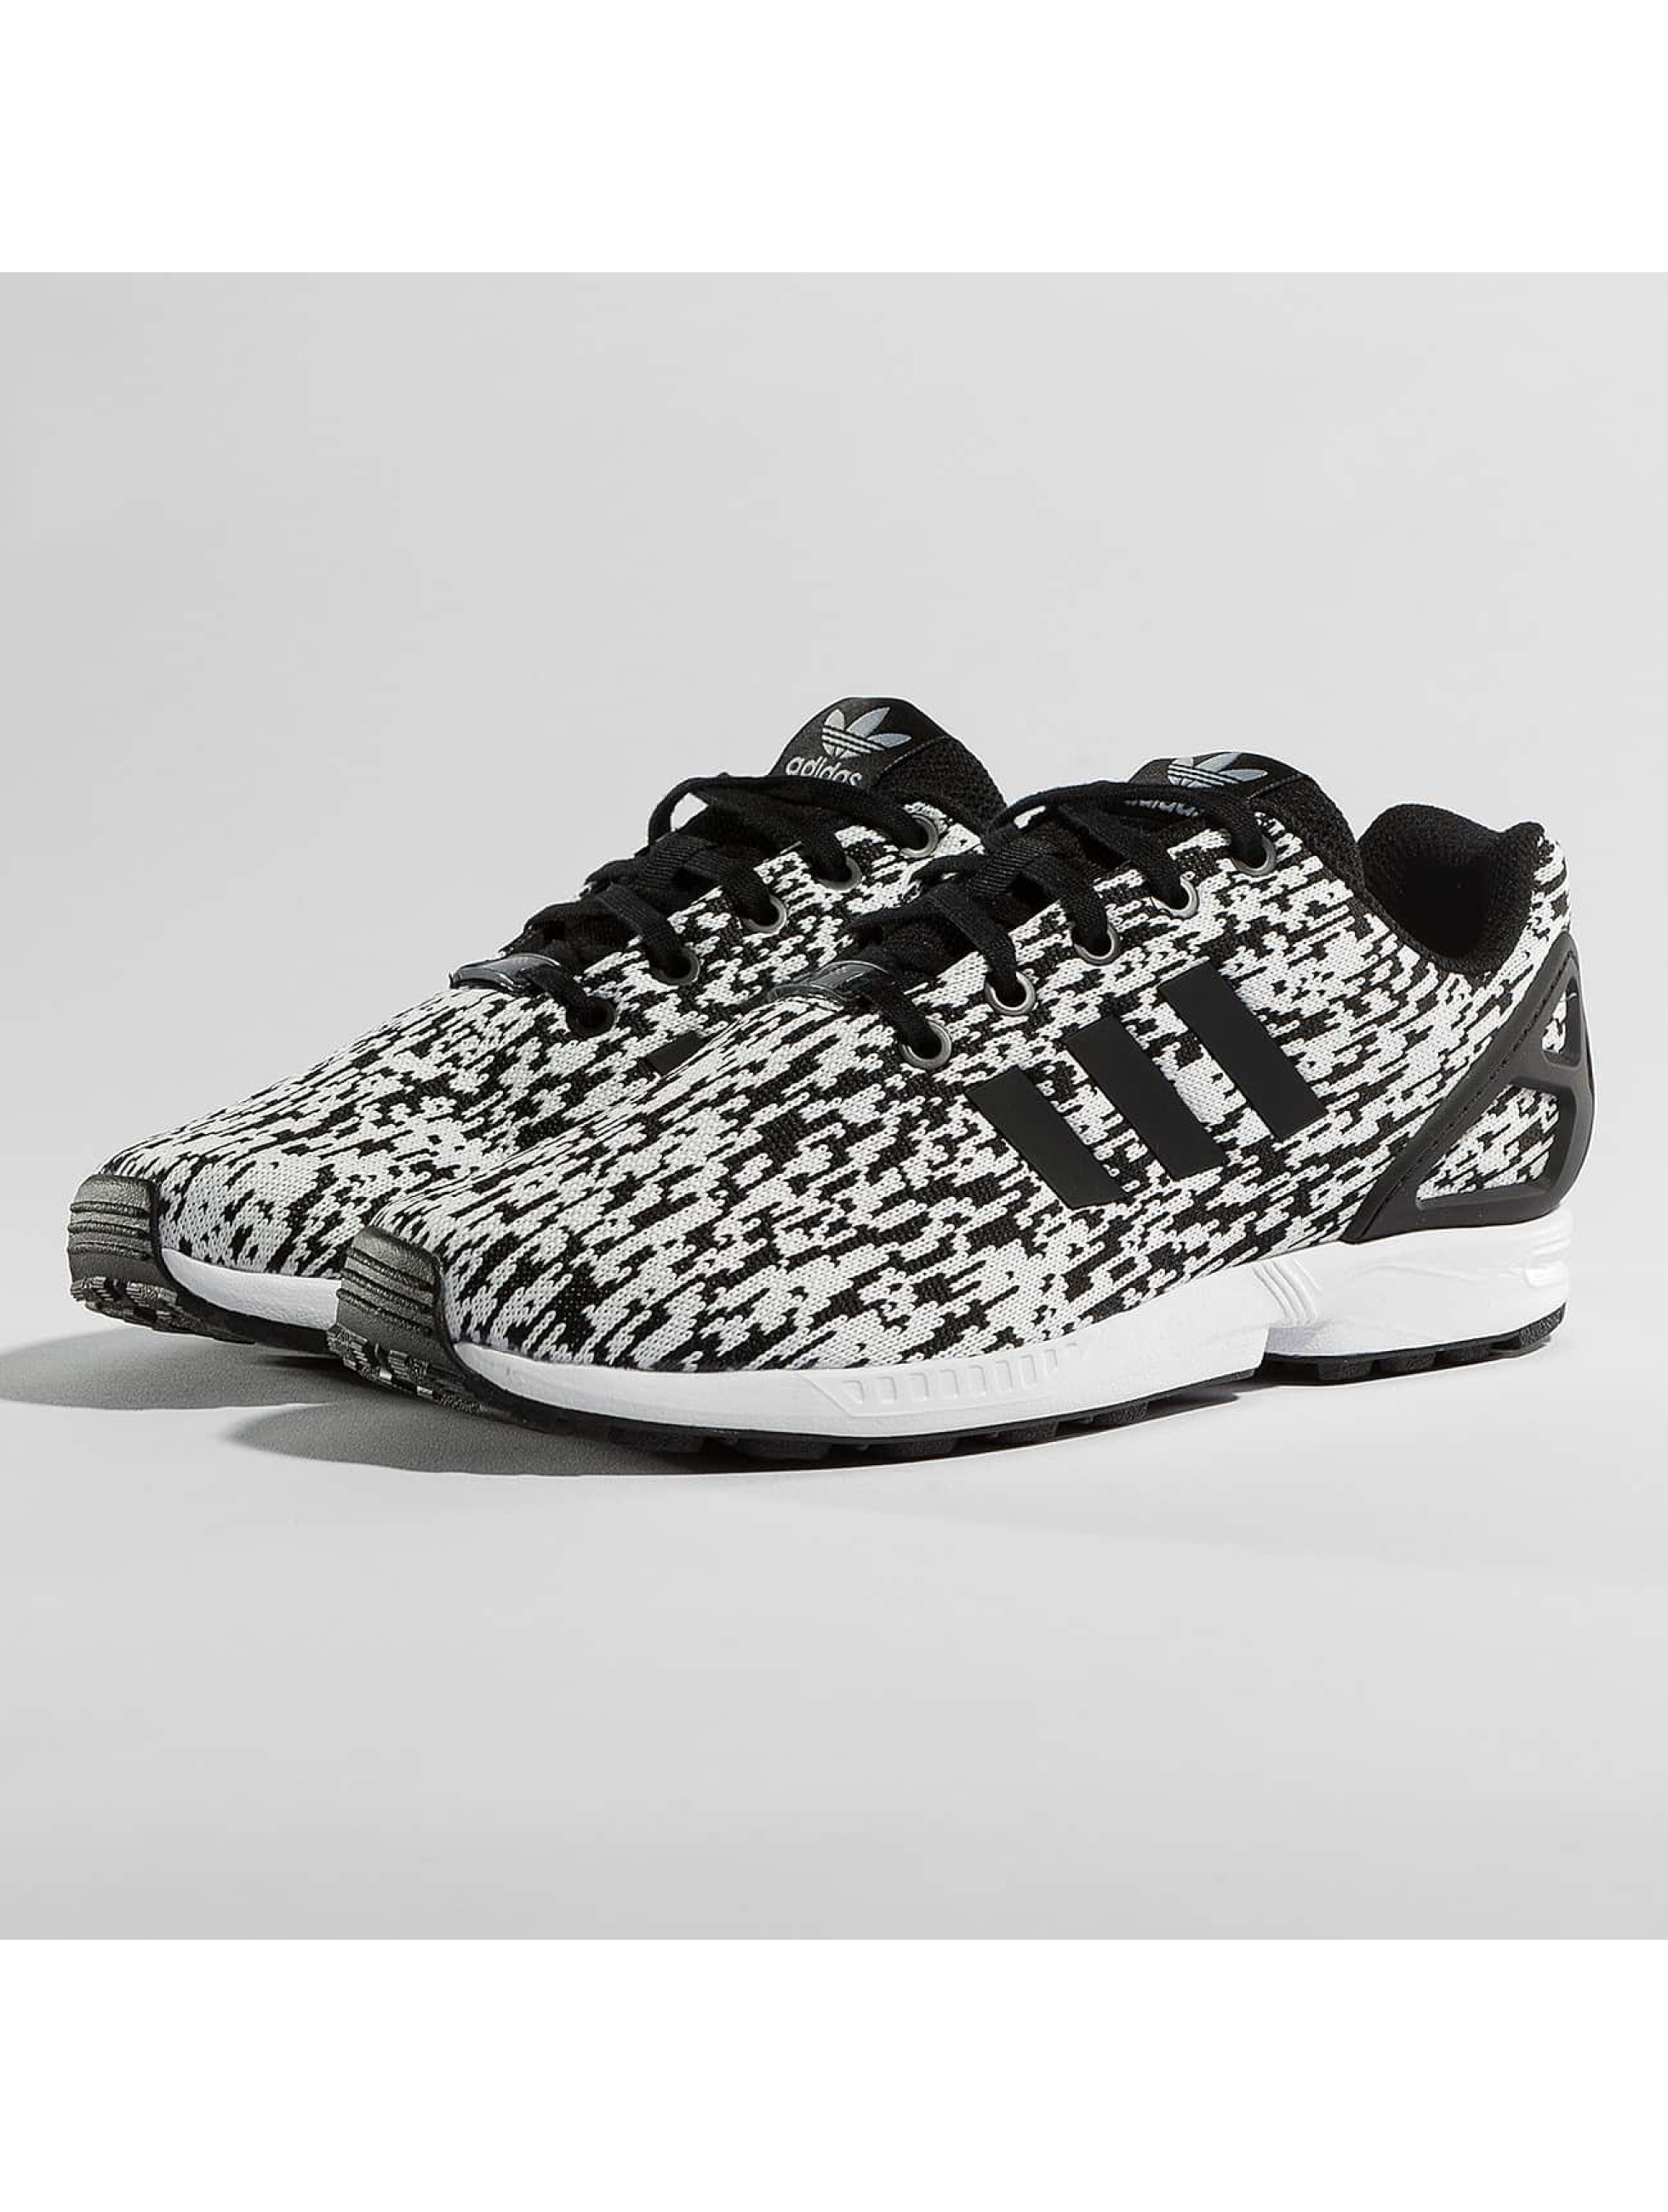 adidas Frauen,Kinder Sneaker ZX Flux J in schwarz